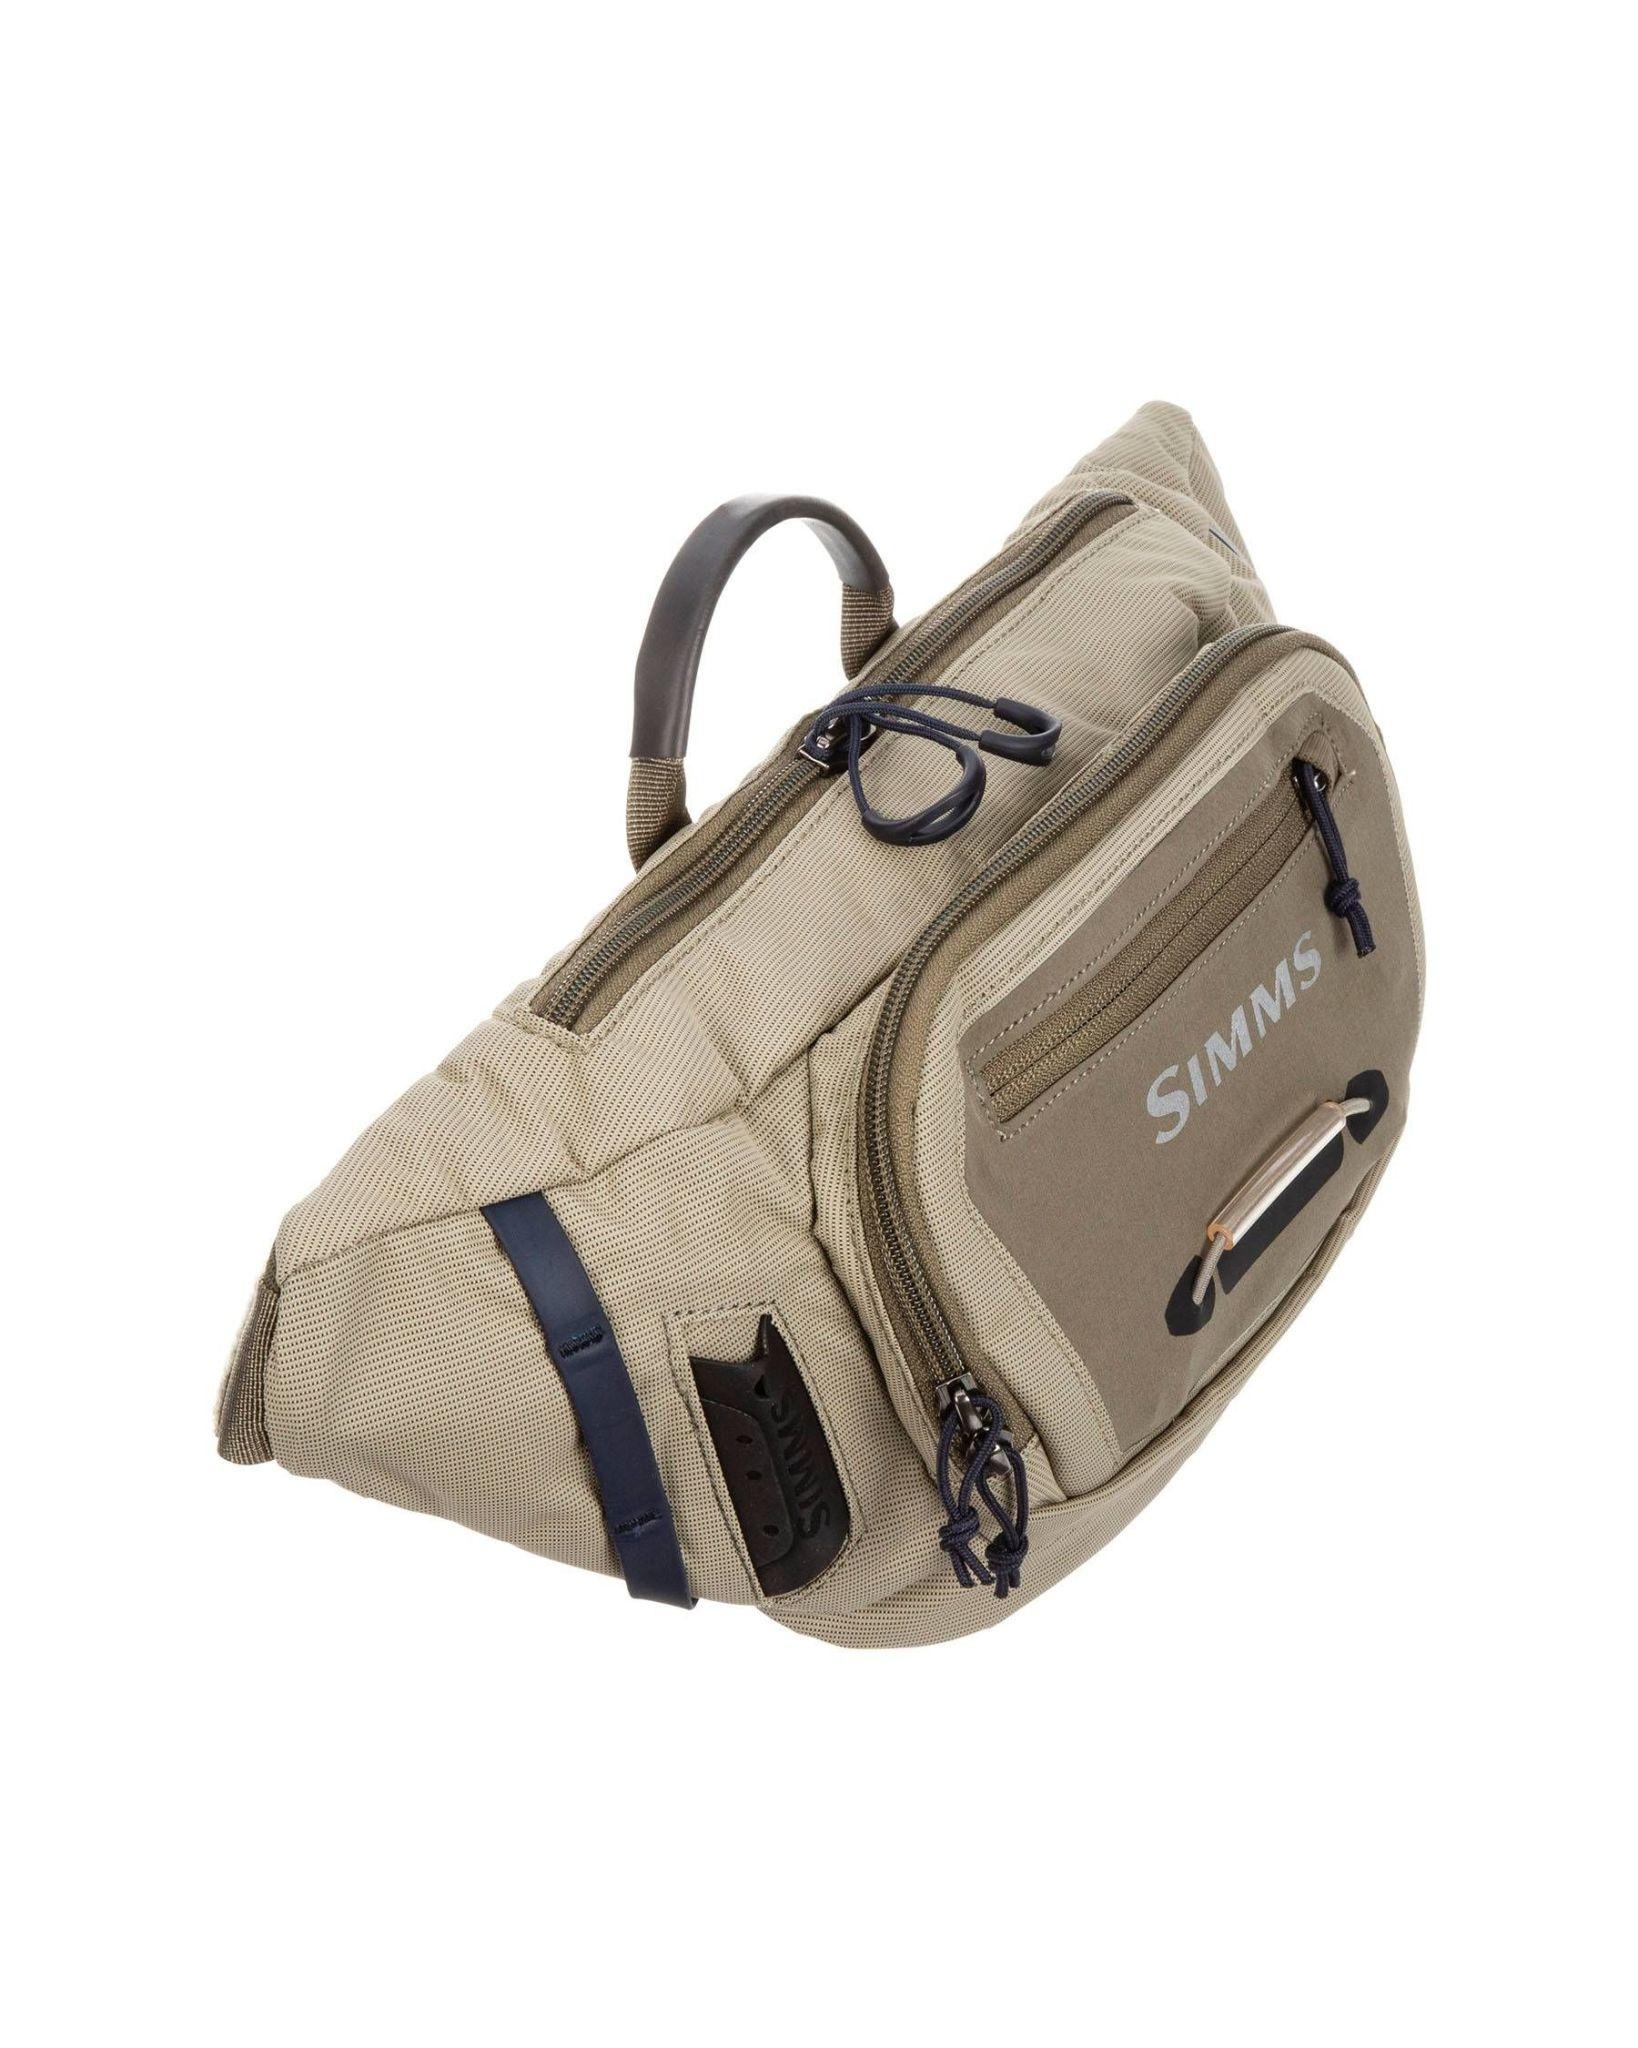 Simms Freestone Tactical Hip Pack, Tan